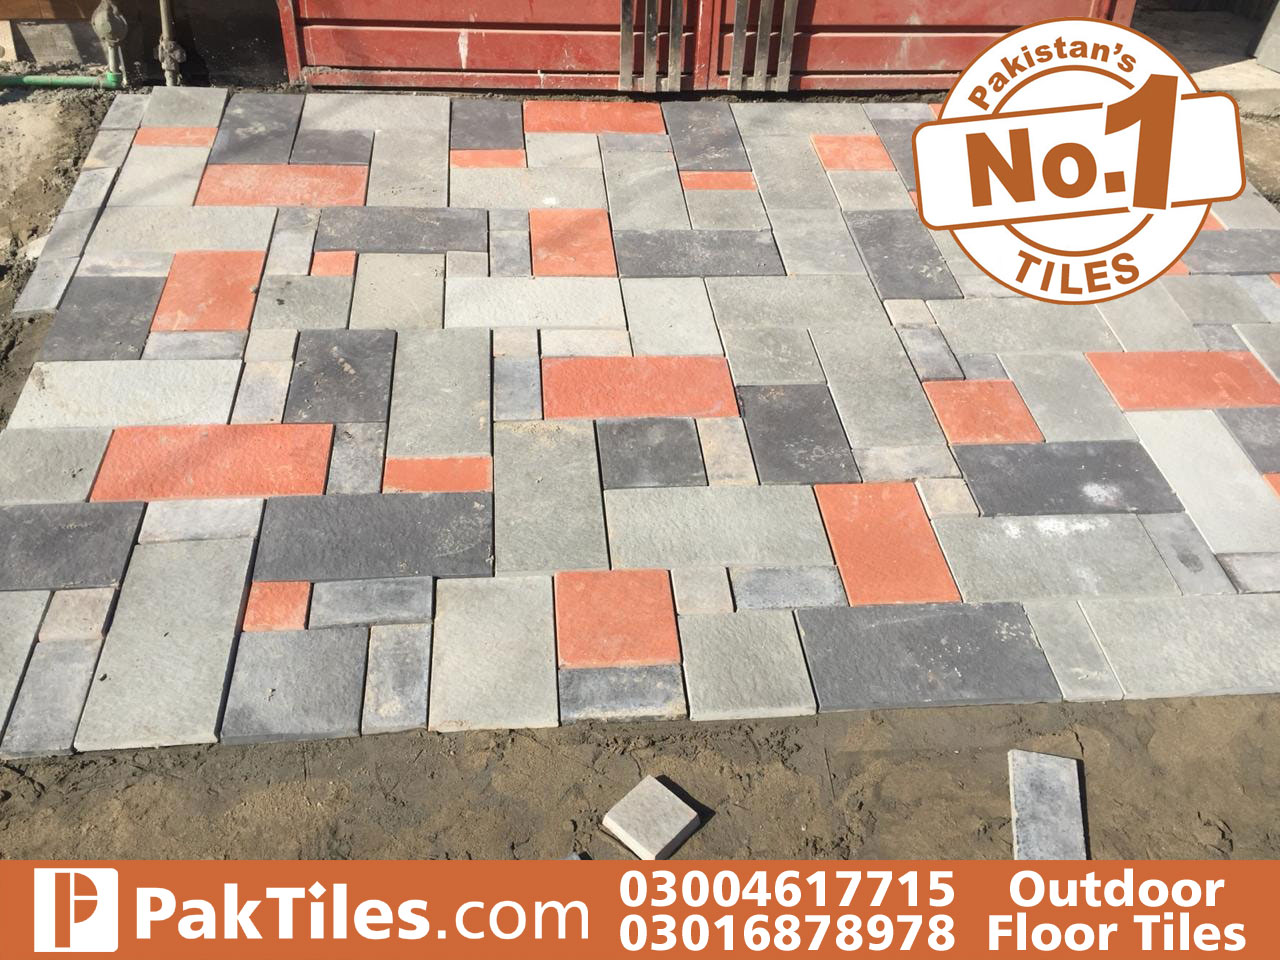 ramp exterior tiles design in pakistan